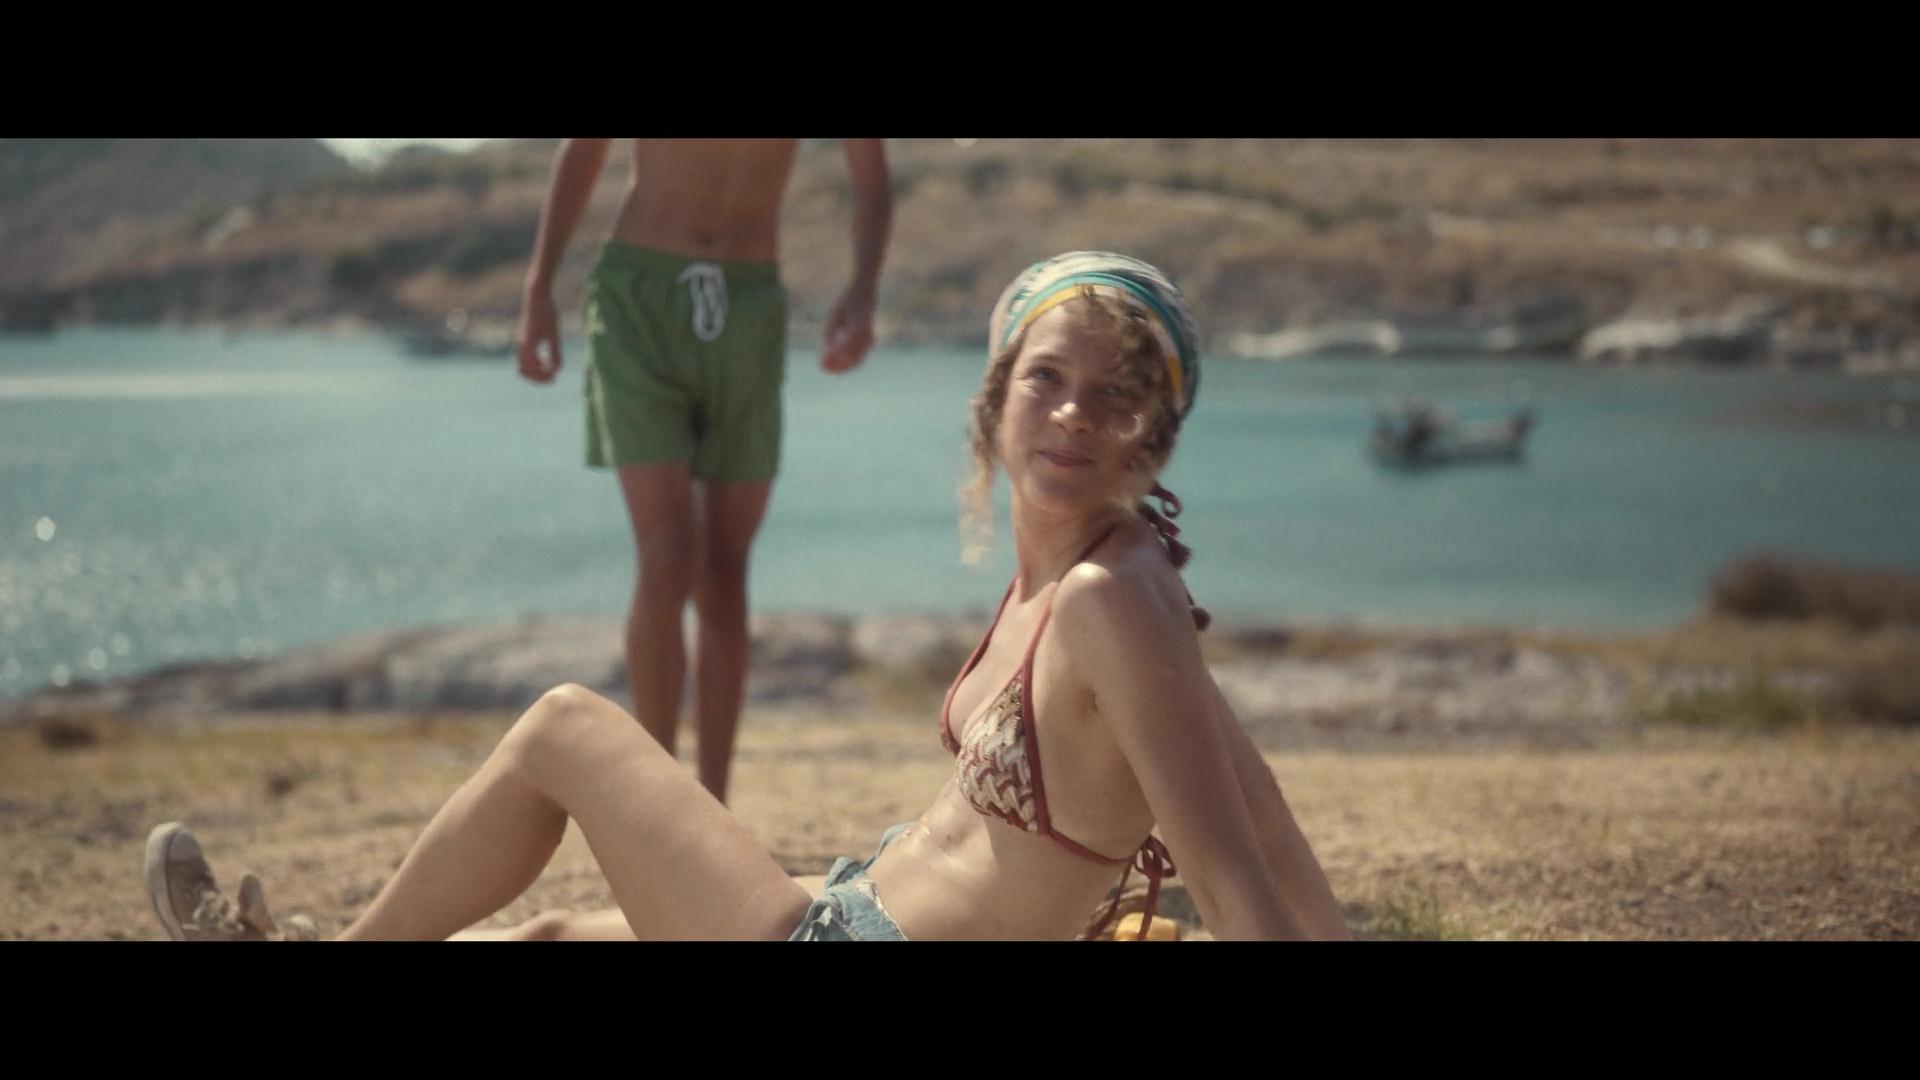 Aquel verano (2021) 1080p WEB-DL Latino